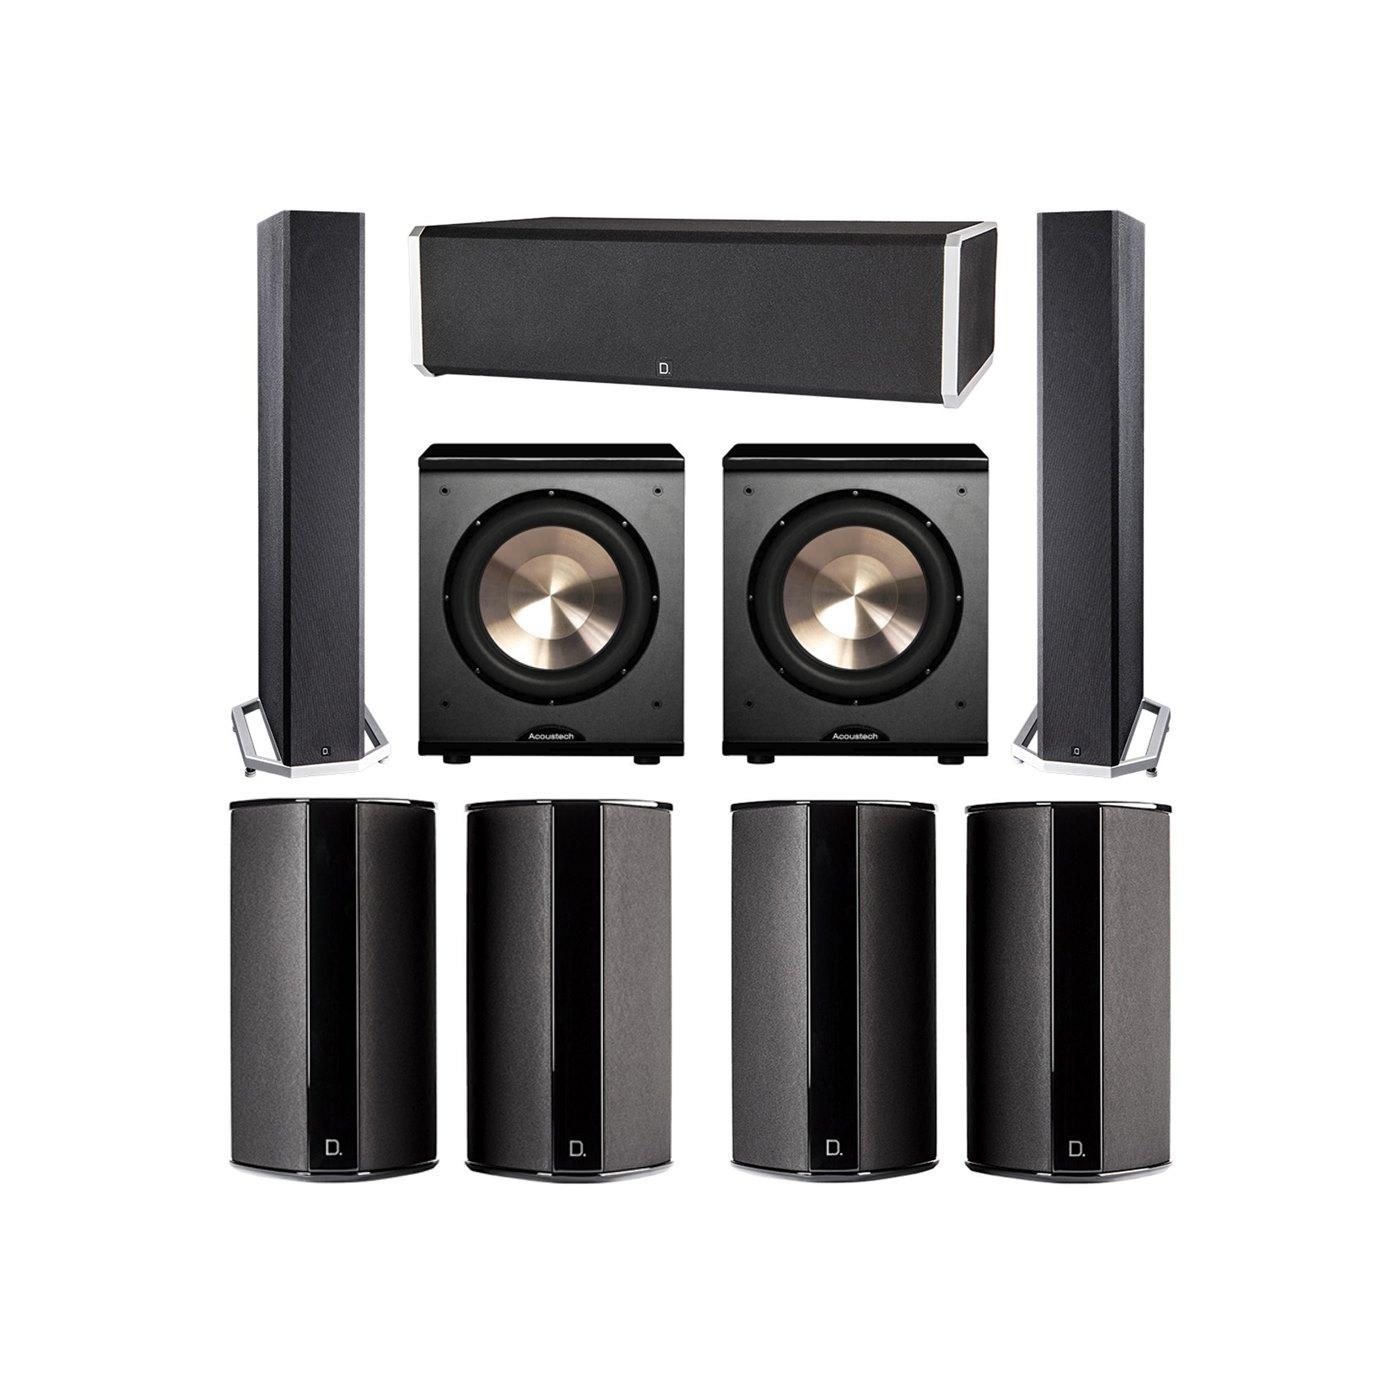 Definitive Technology 7.2 System with 2 BP9040 Tower Speakers, 1 CS9060 Center Channel Speaker, 4 SR9080 Surround Speaker, 2 BIC PL-200 Subwoofer